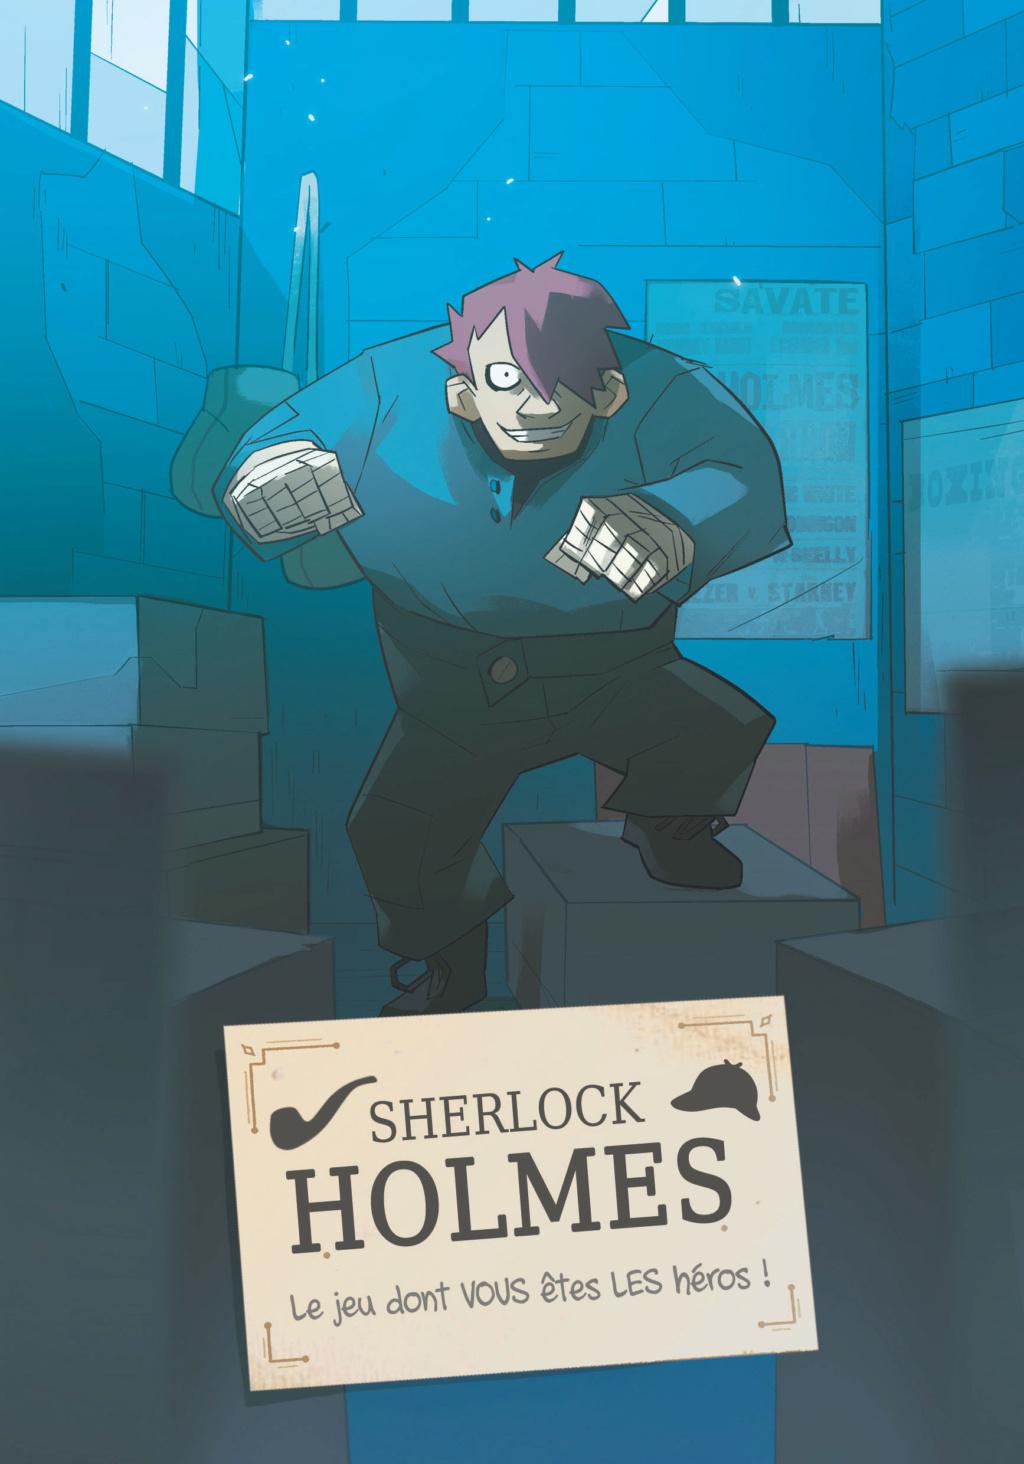 [Makaka] Sherlock Holmes, le jeu dont vous êtes LES héros Ike10